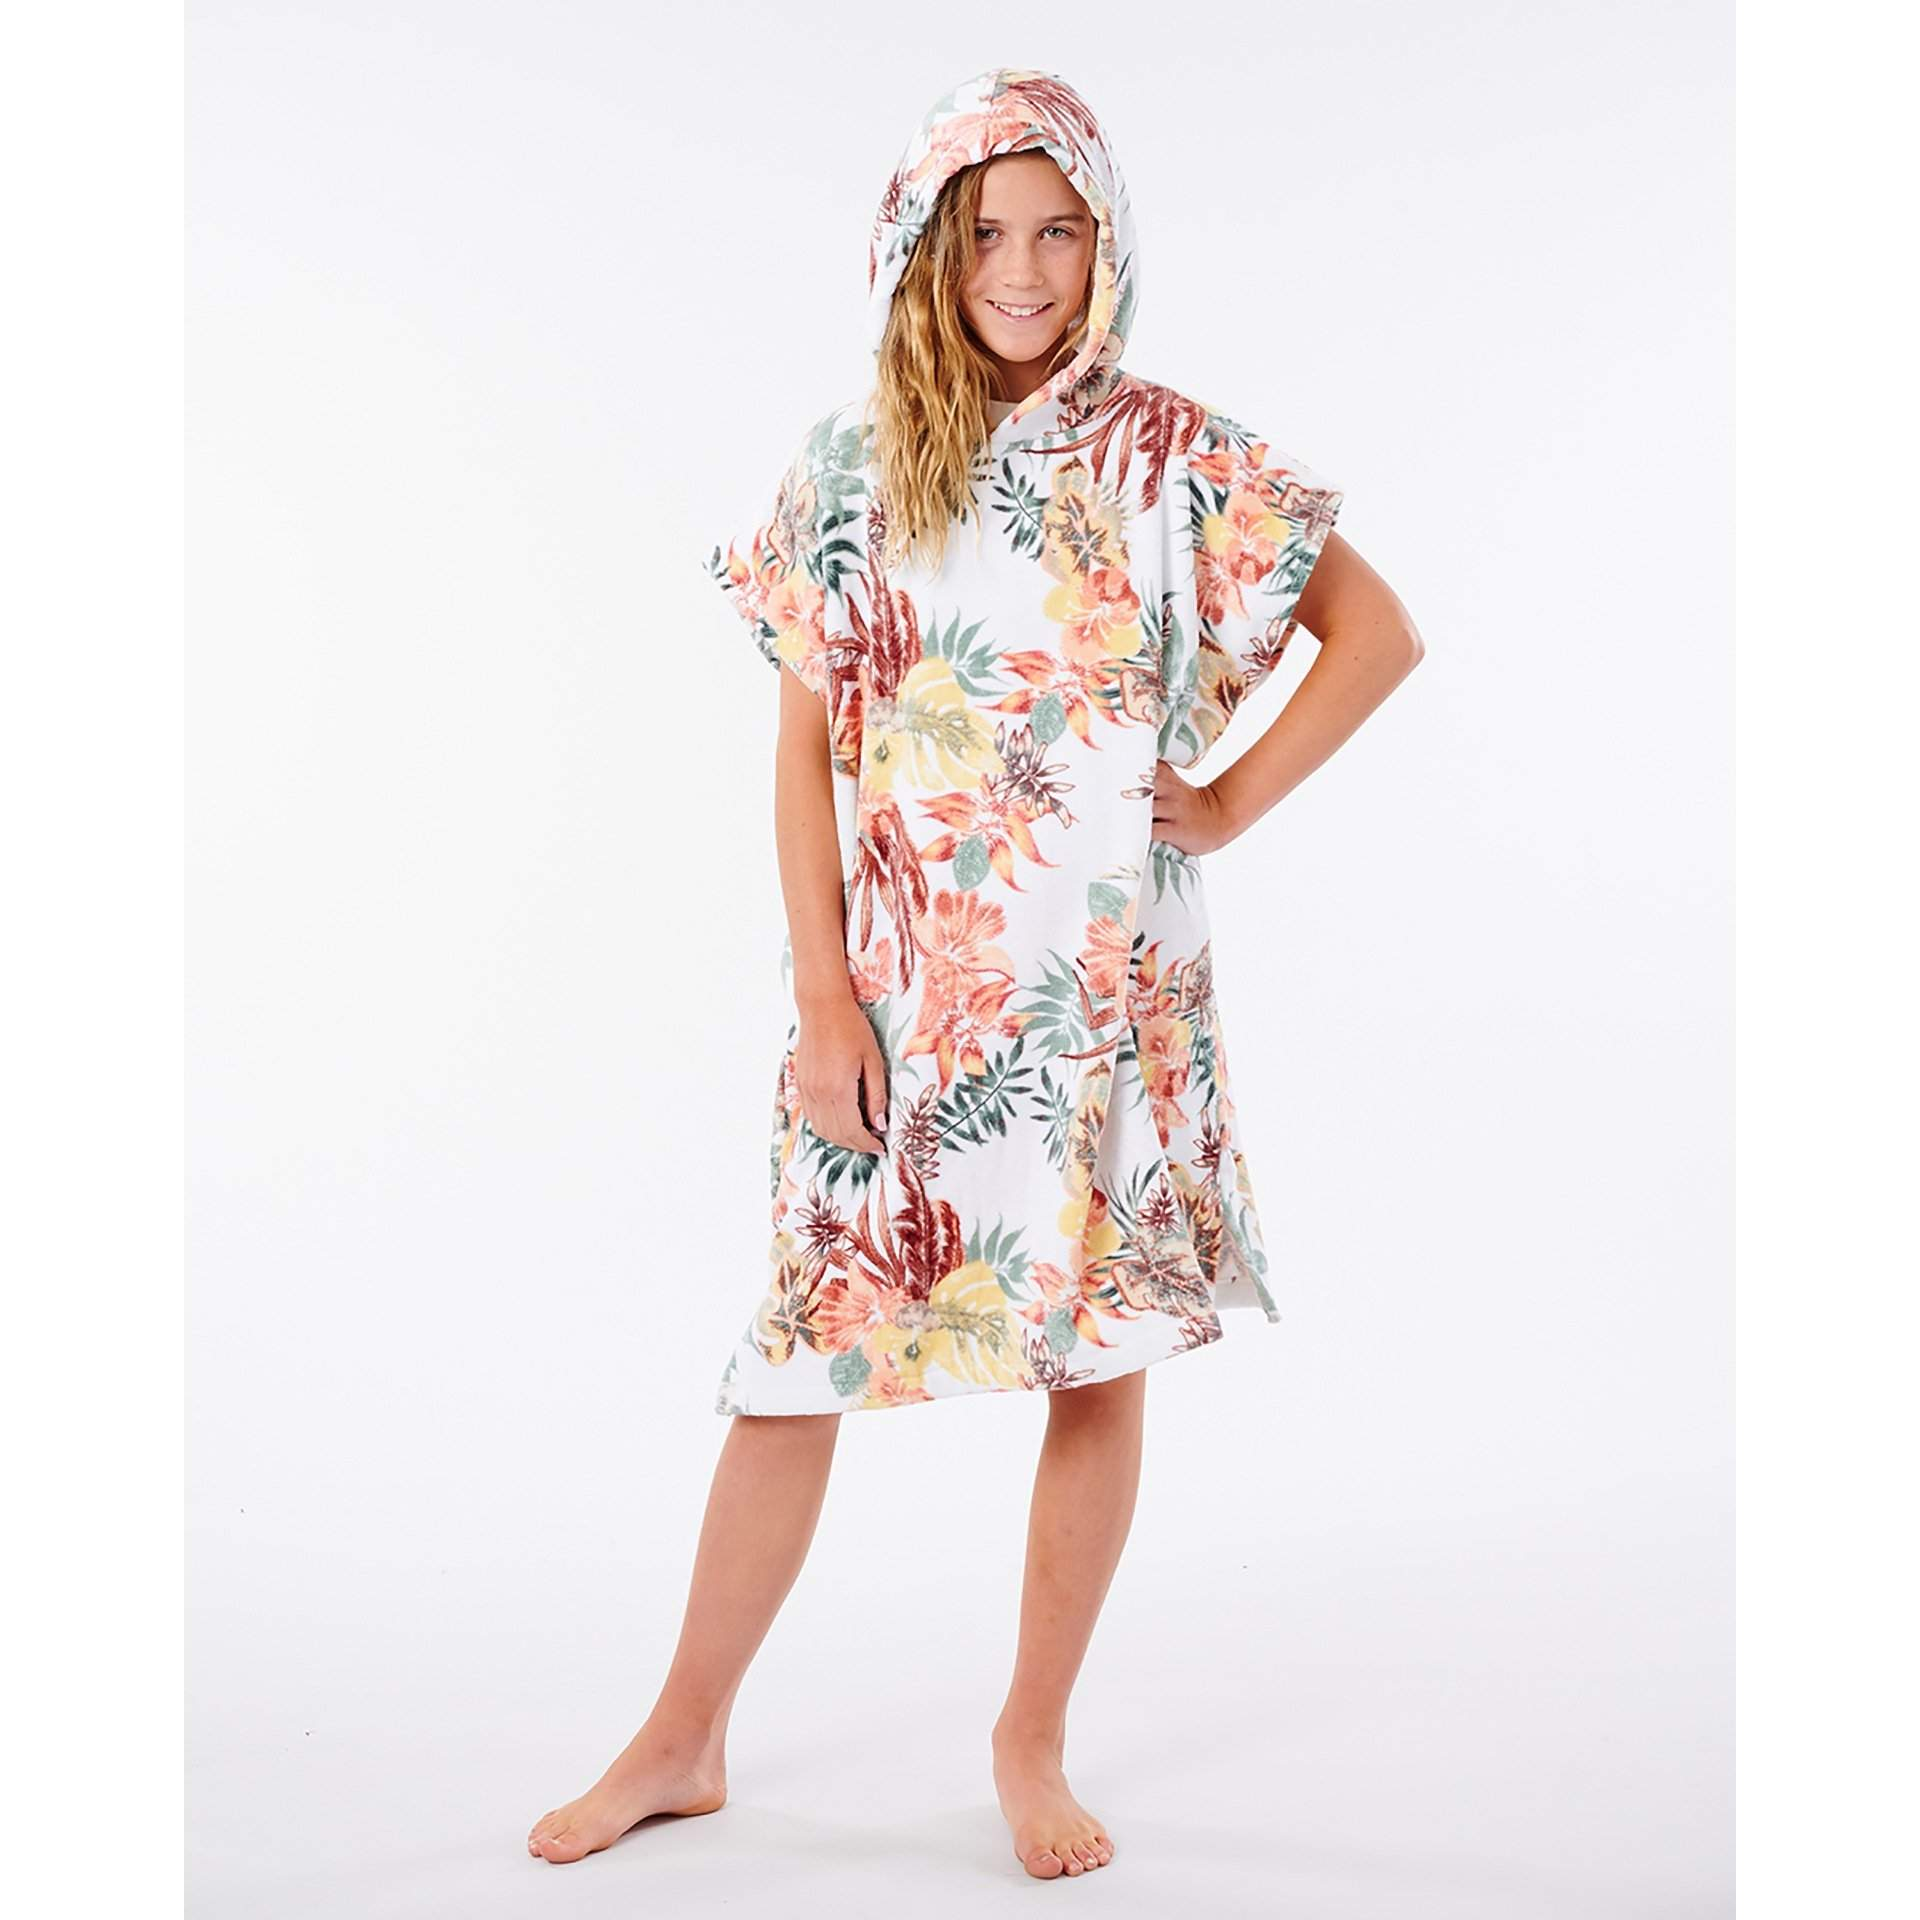 PONCHO RĘCZNIK RIP CURL TALLOWS HOOD TOWEL GIRL JTWAG1 1000 WHITE W KAPTURZE